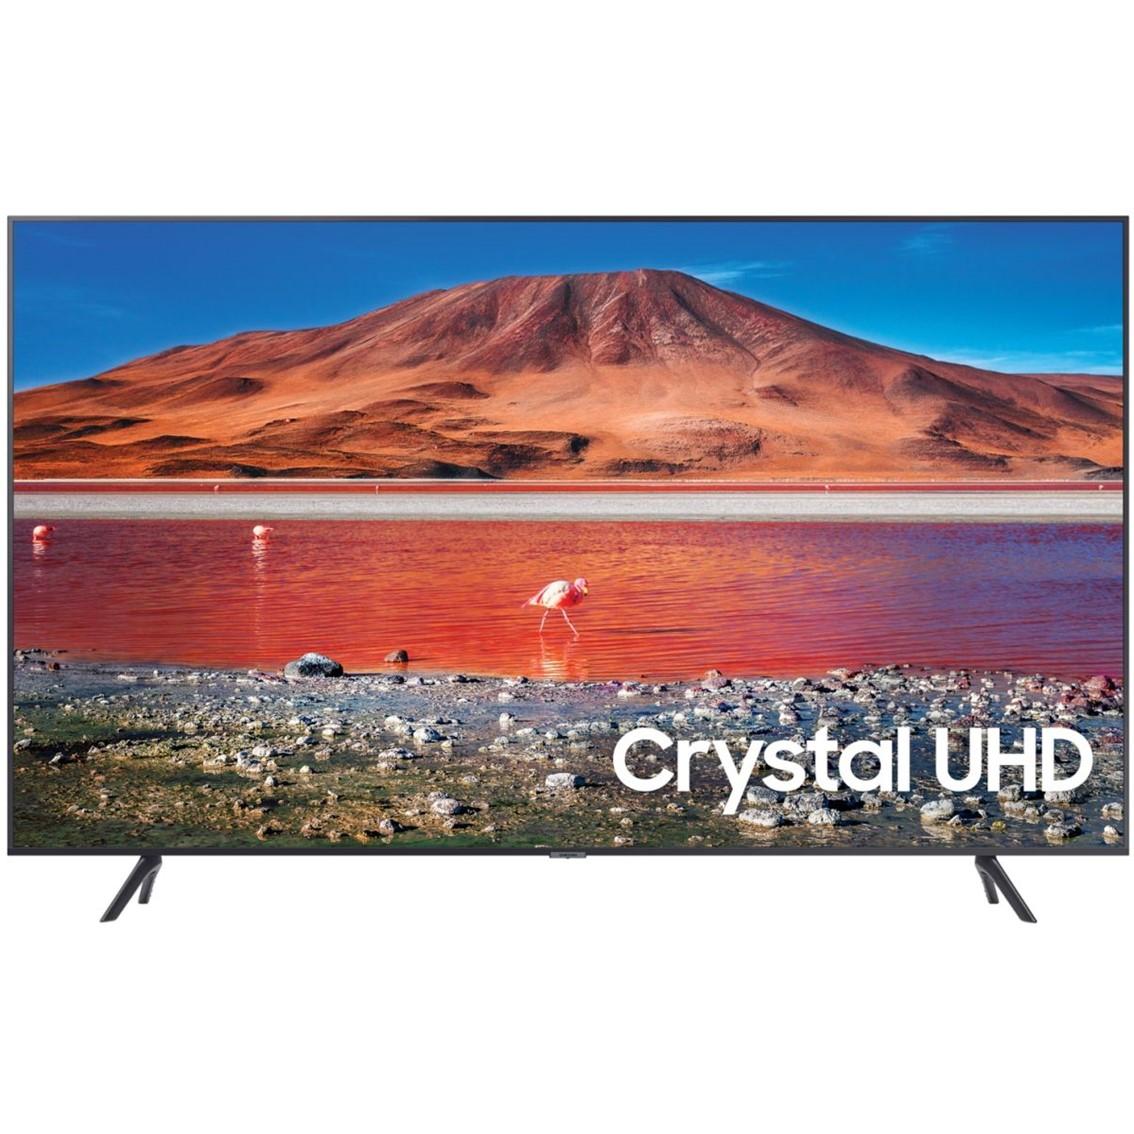 Tv samsung 65pulgadas led 4k uhd -  smart tv -  hdr10+ - dolby digital -  wifi -  hdmi -  usb